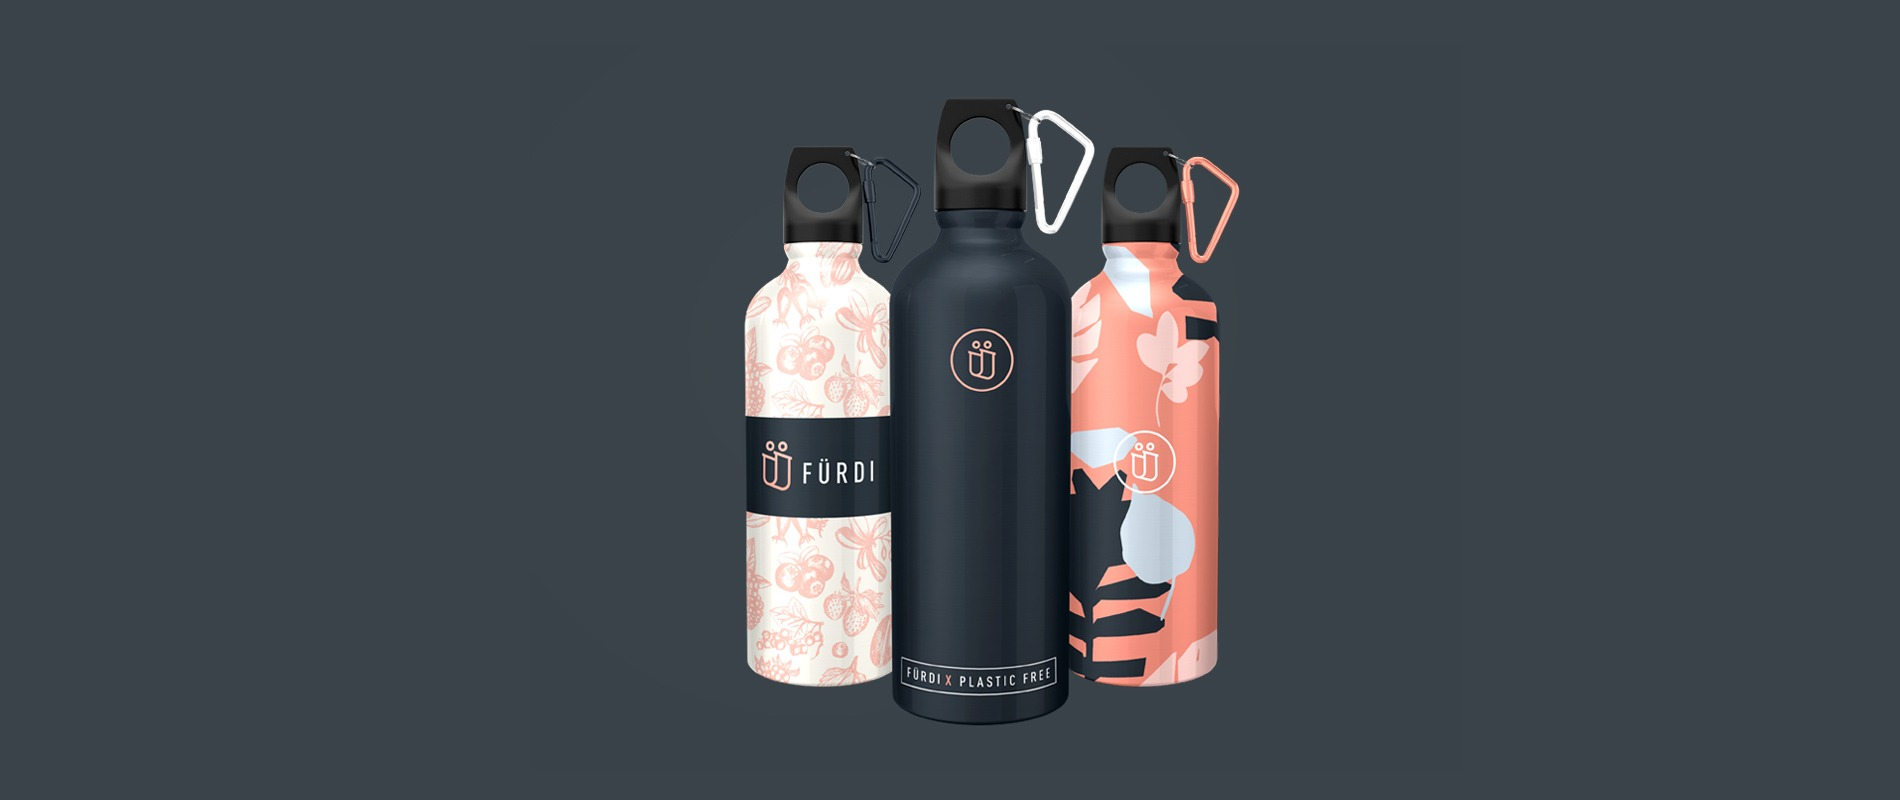 branding design furdi